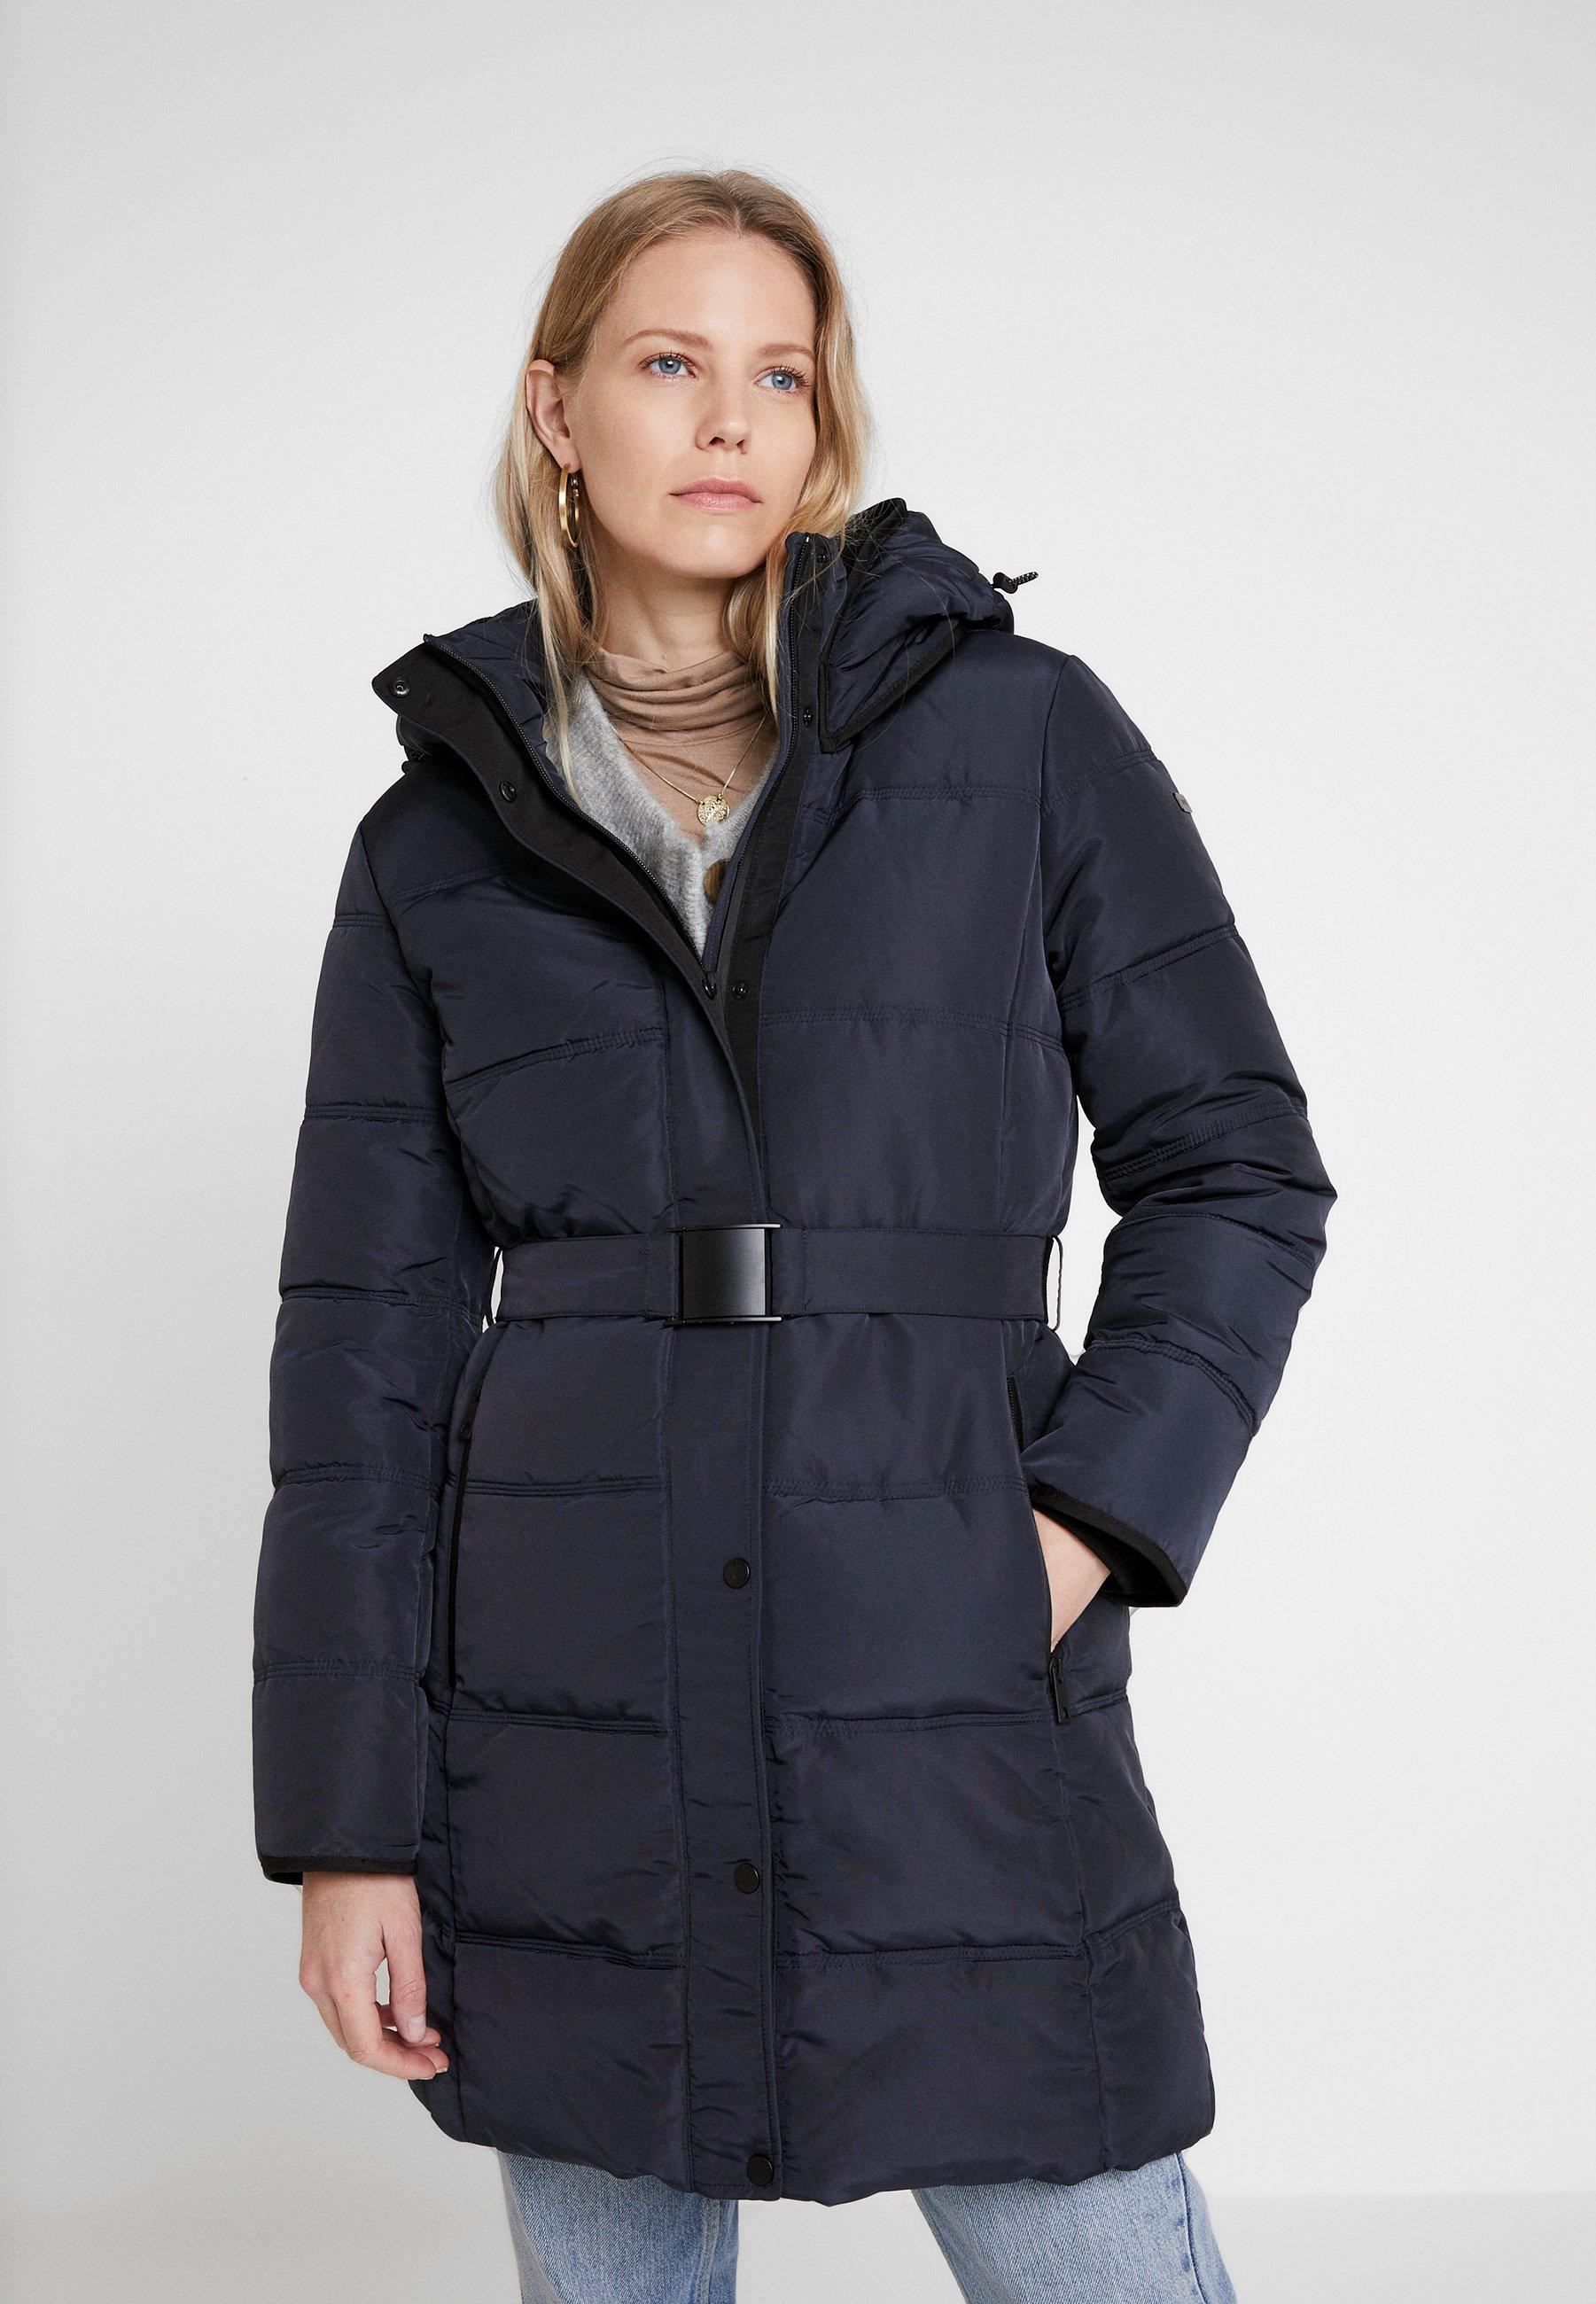 Esprit Coat - Winterjas Navy sNGMFEBN